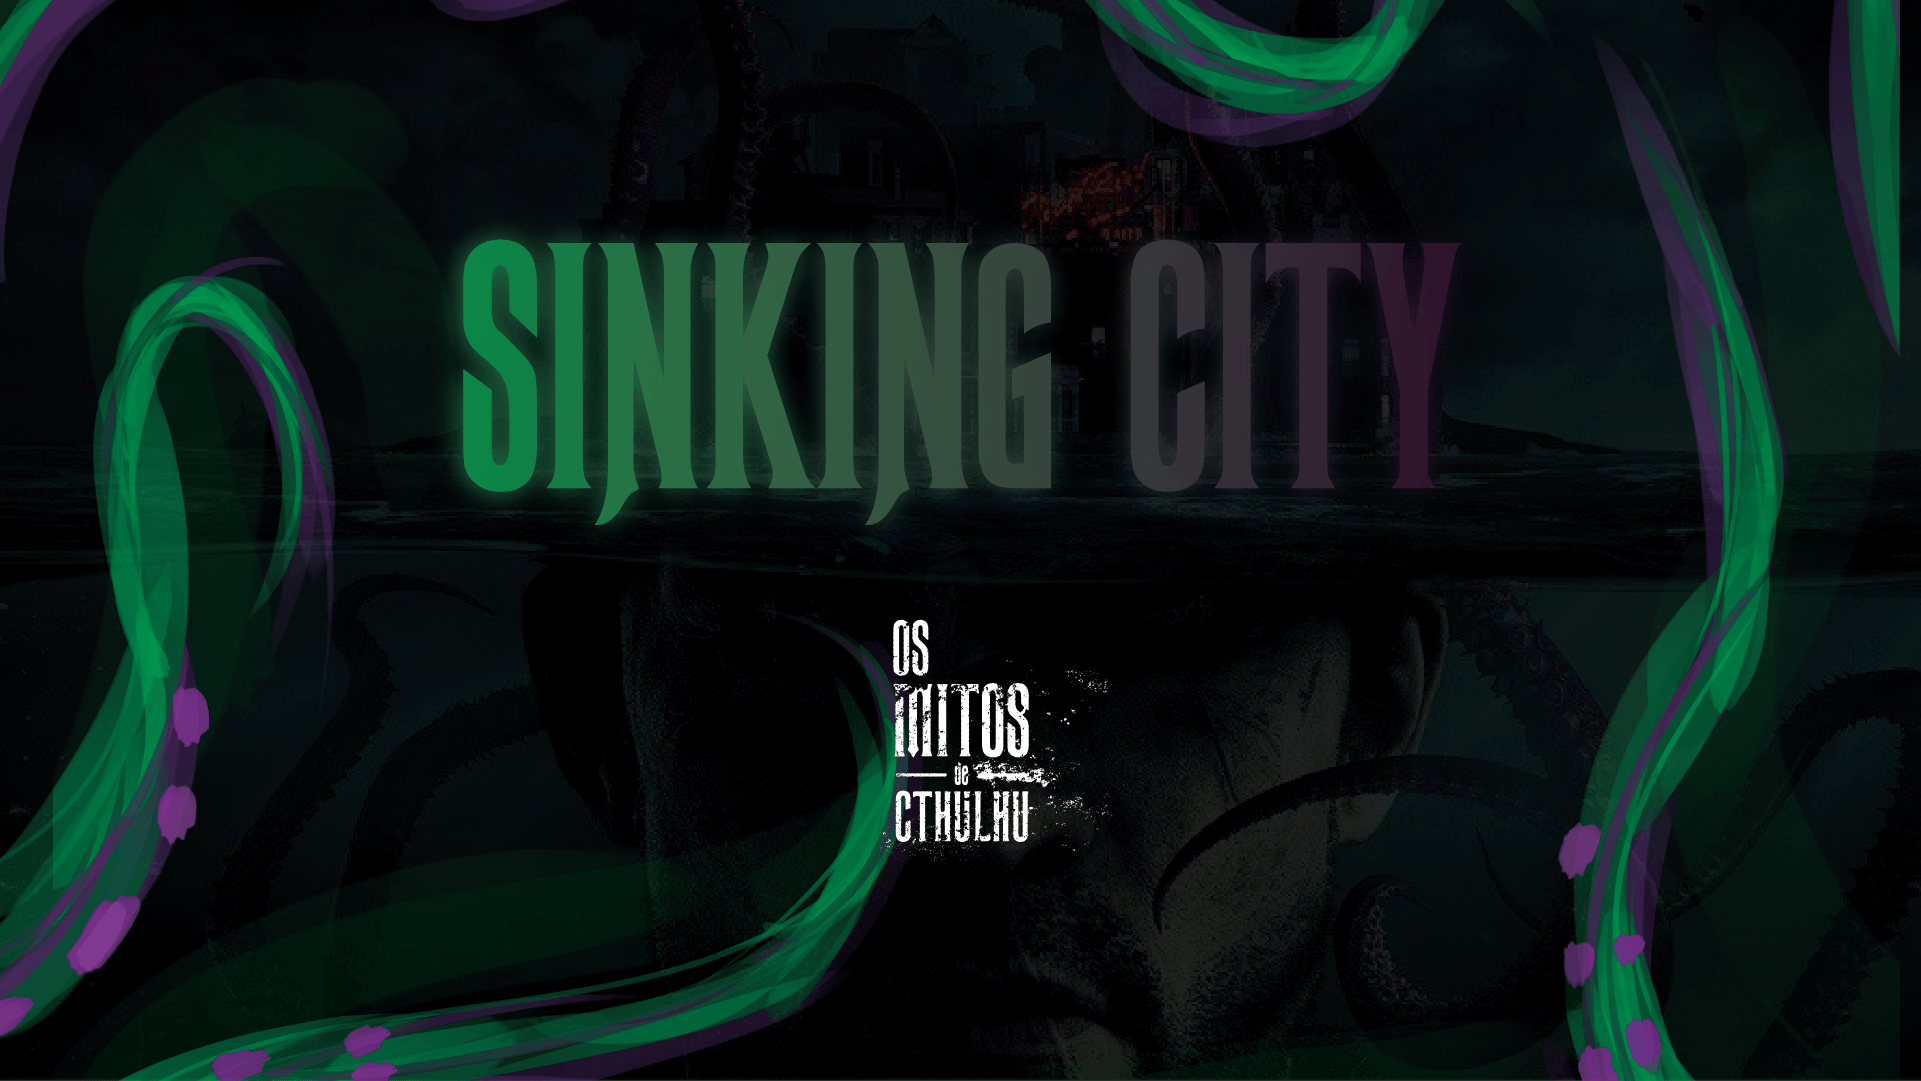 5 MOTIVOS para jogar The Sinking City | Mitos de Cthulhu